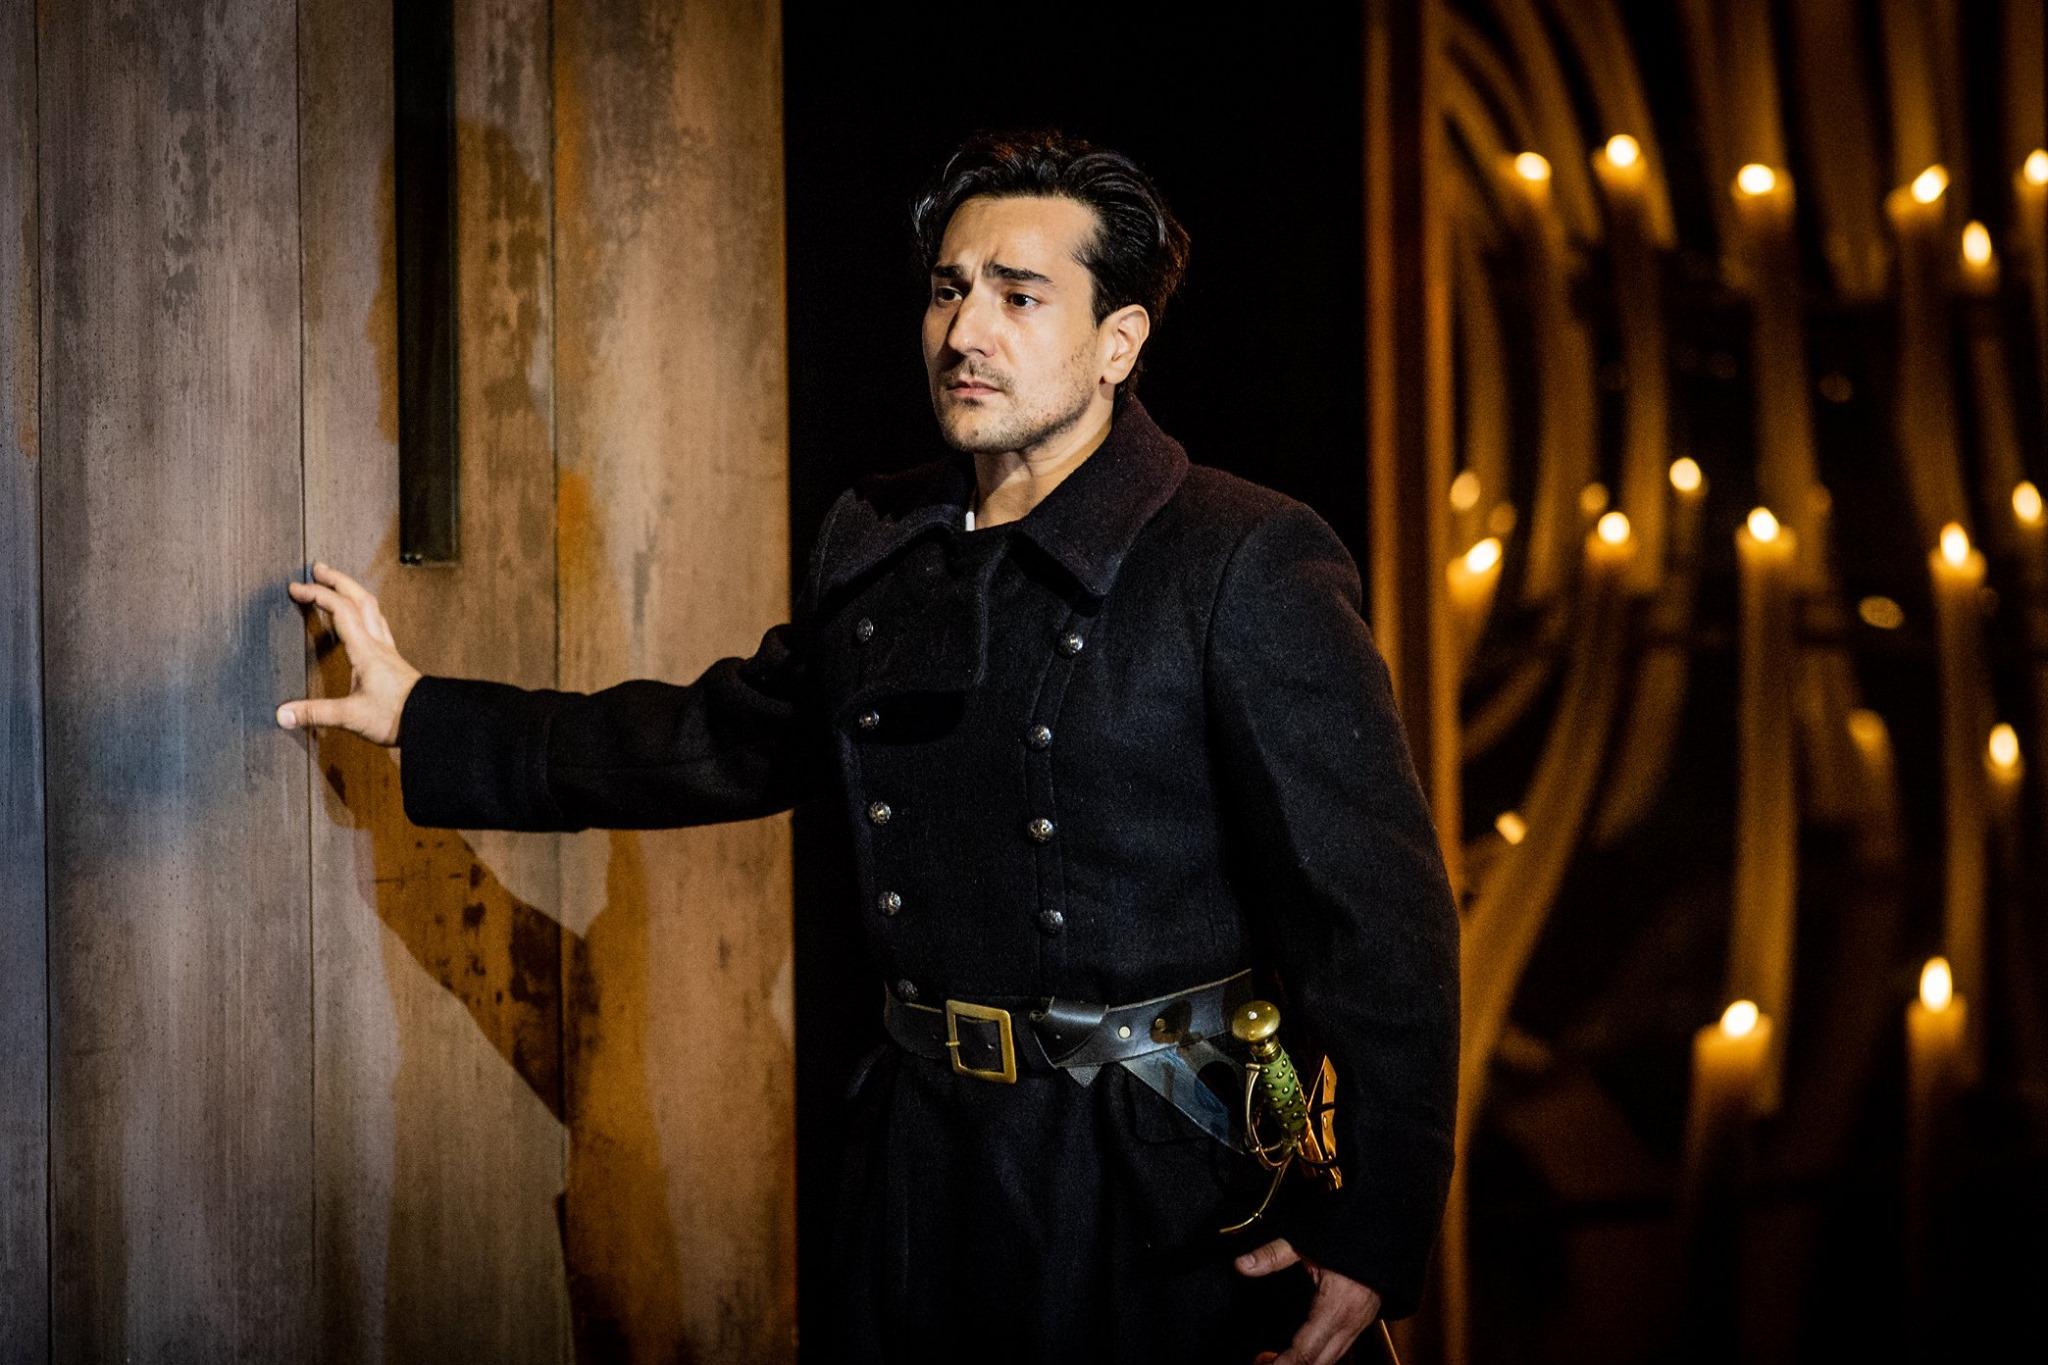 Leonardo Capalbo as Don Carlo. Photo by Robert Workman.